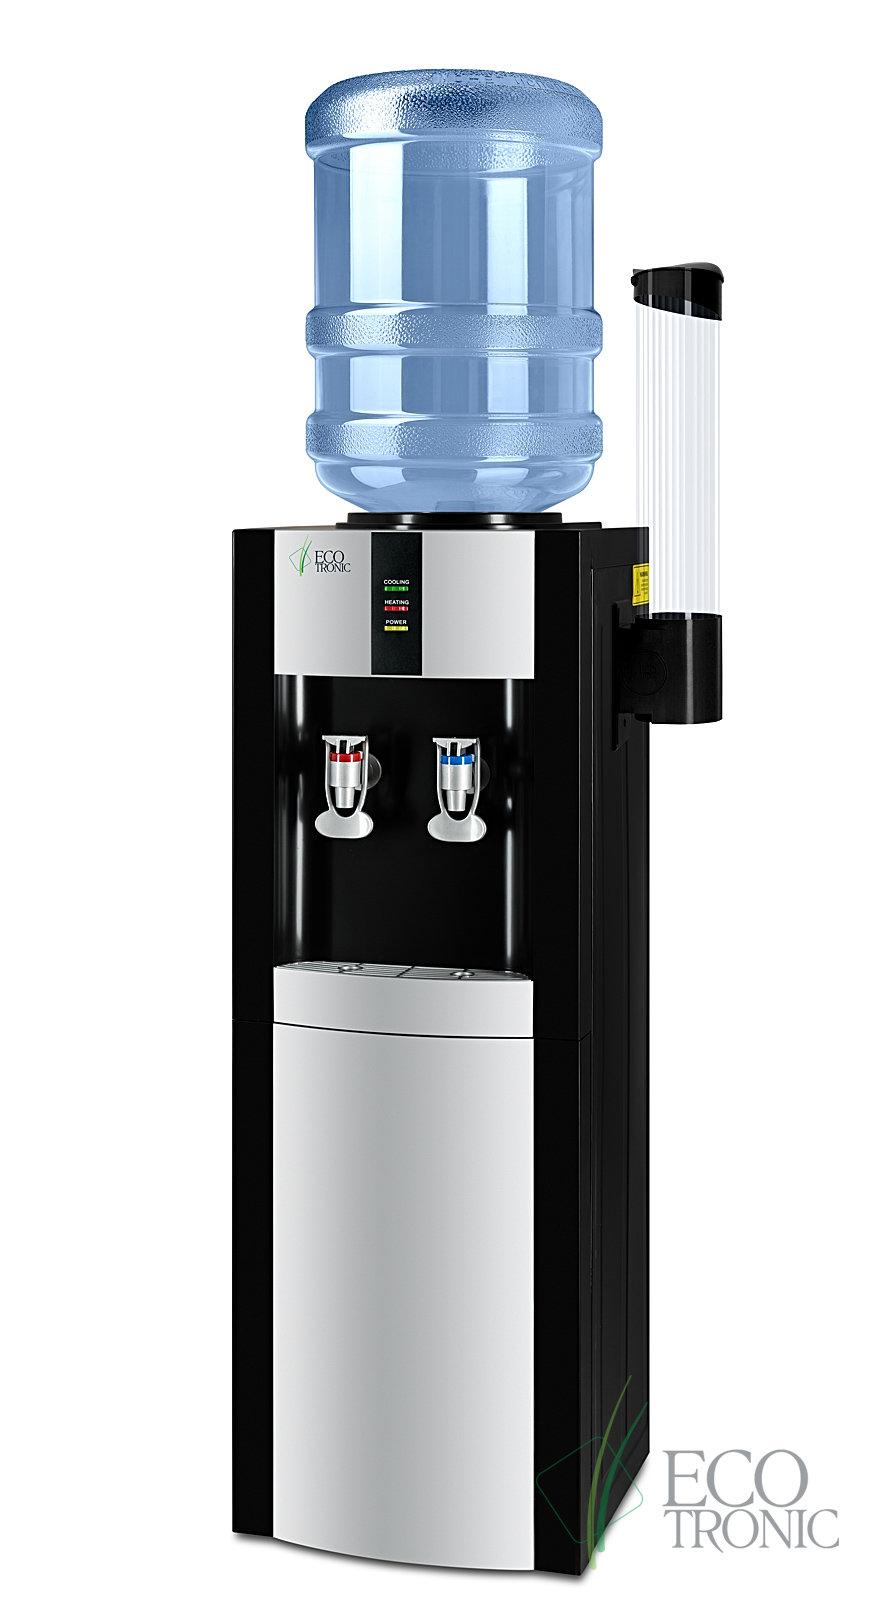 Кулер для воды Ecotronic H1-LE Black v.2 напольный